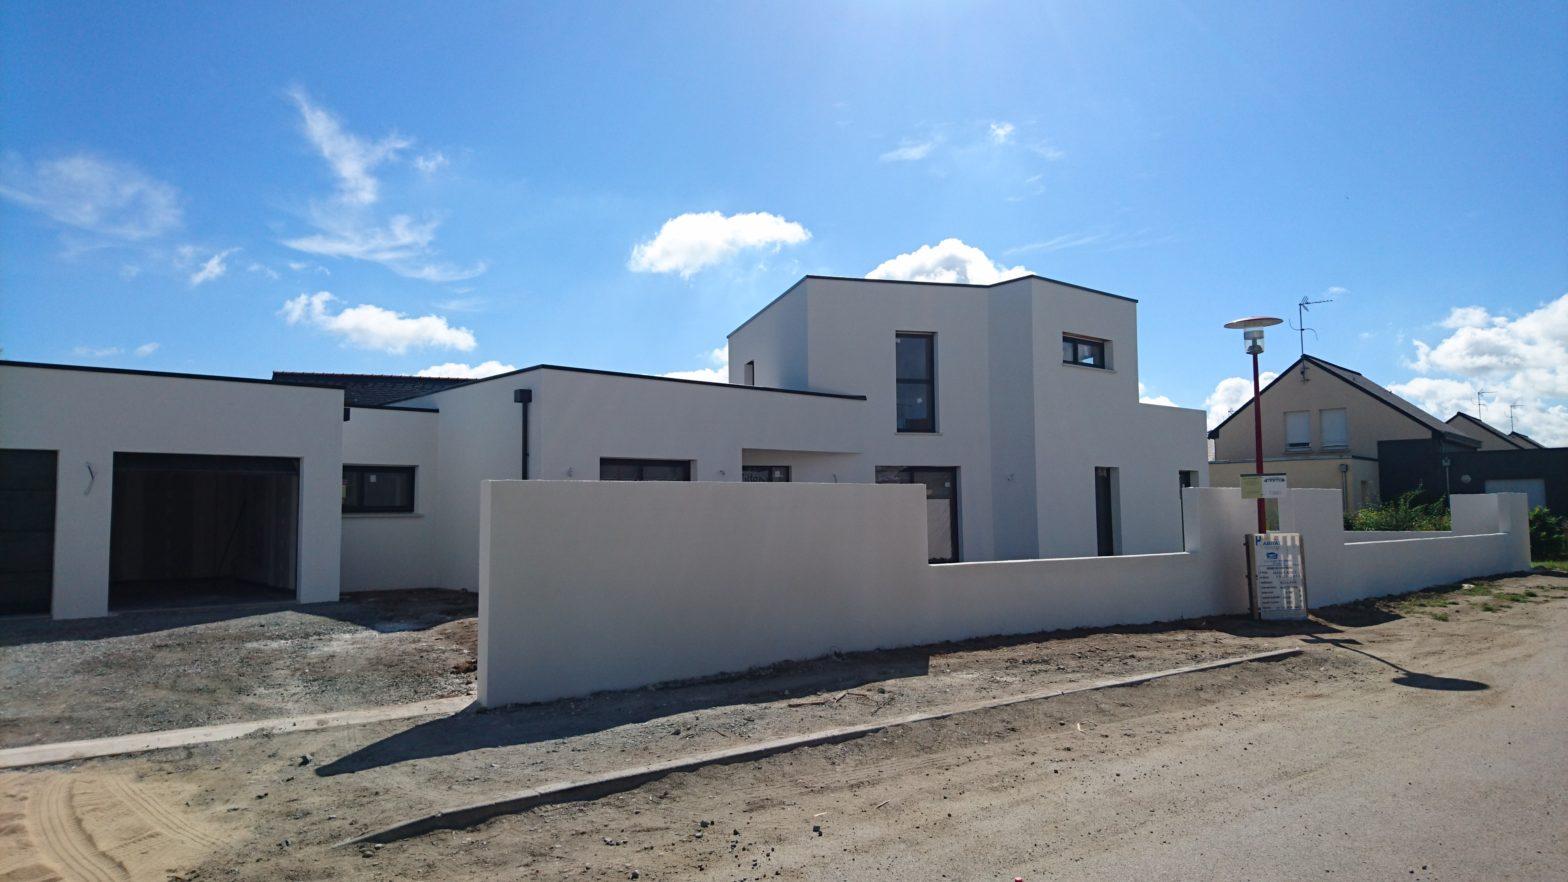 maison etage r+1 toit terrasse plat 49220 grez neuville